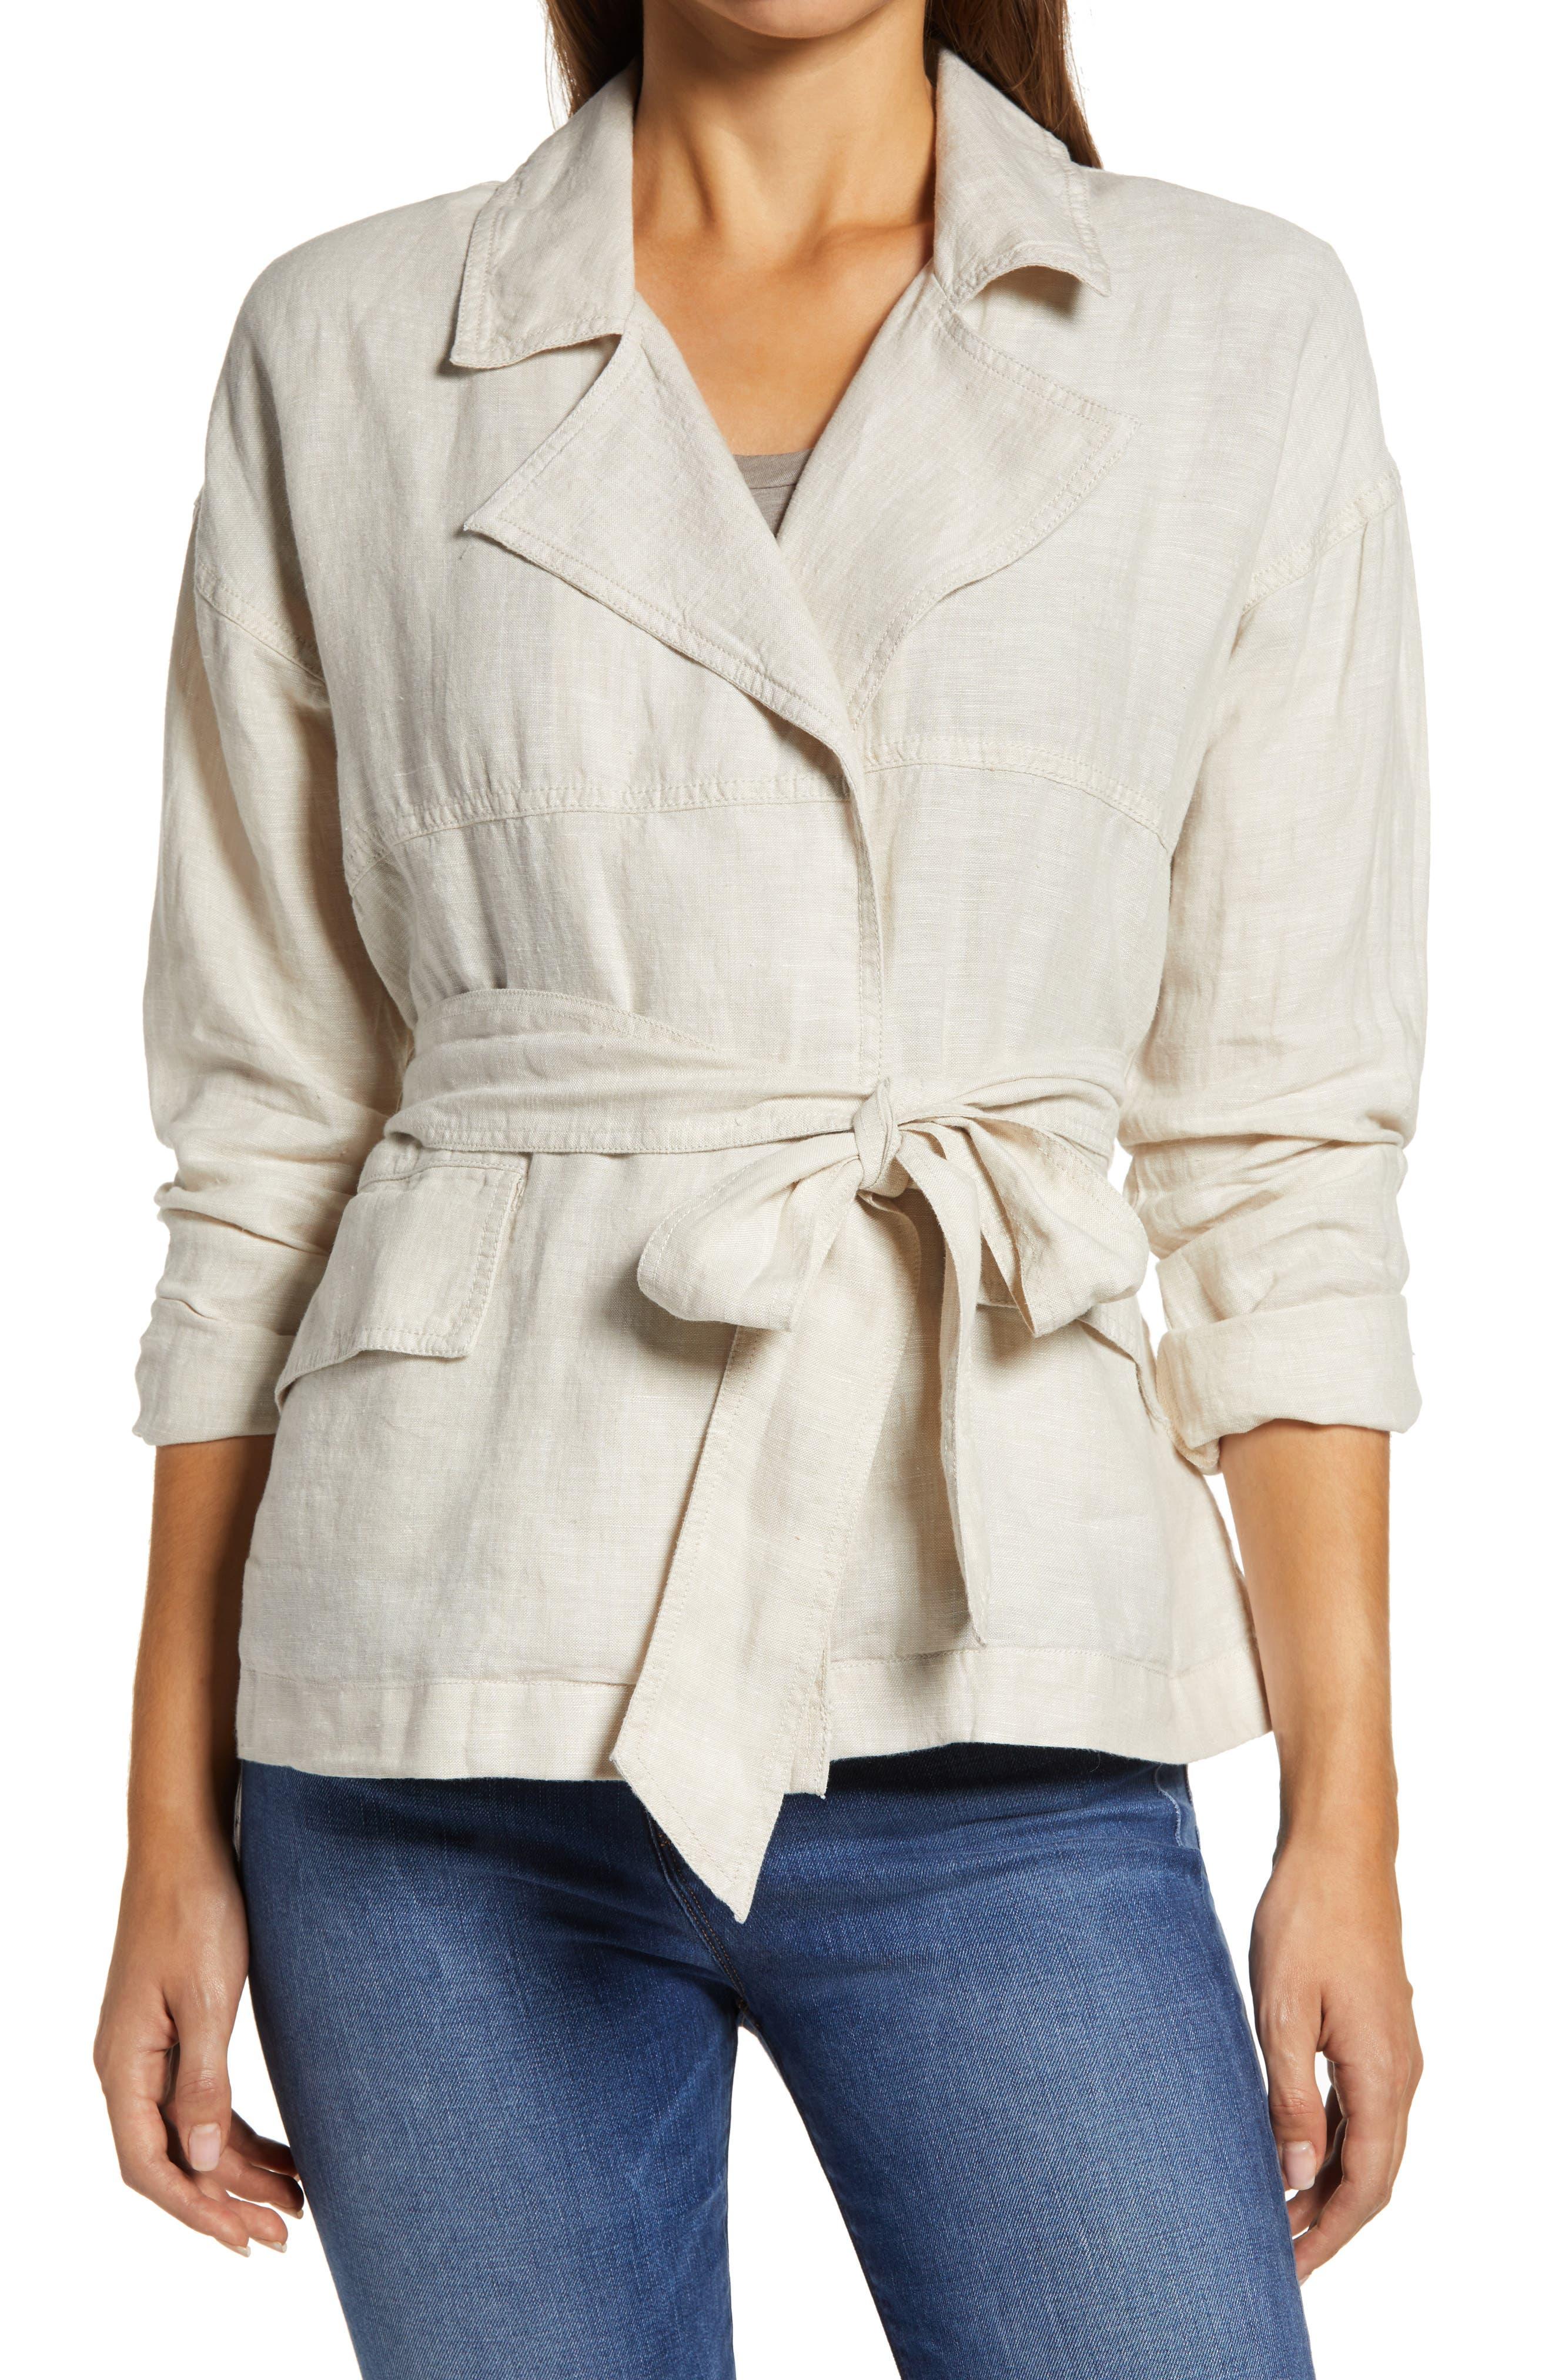 1920s Coats, Furs, Jackets and Capes History Womens Caslon Belted Linen Jacket $24.97 AT vintagedancer.com